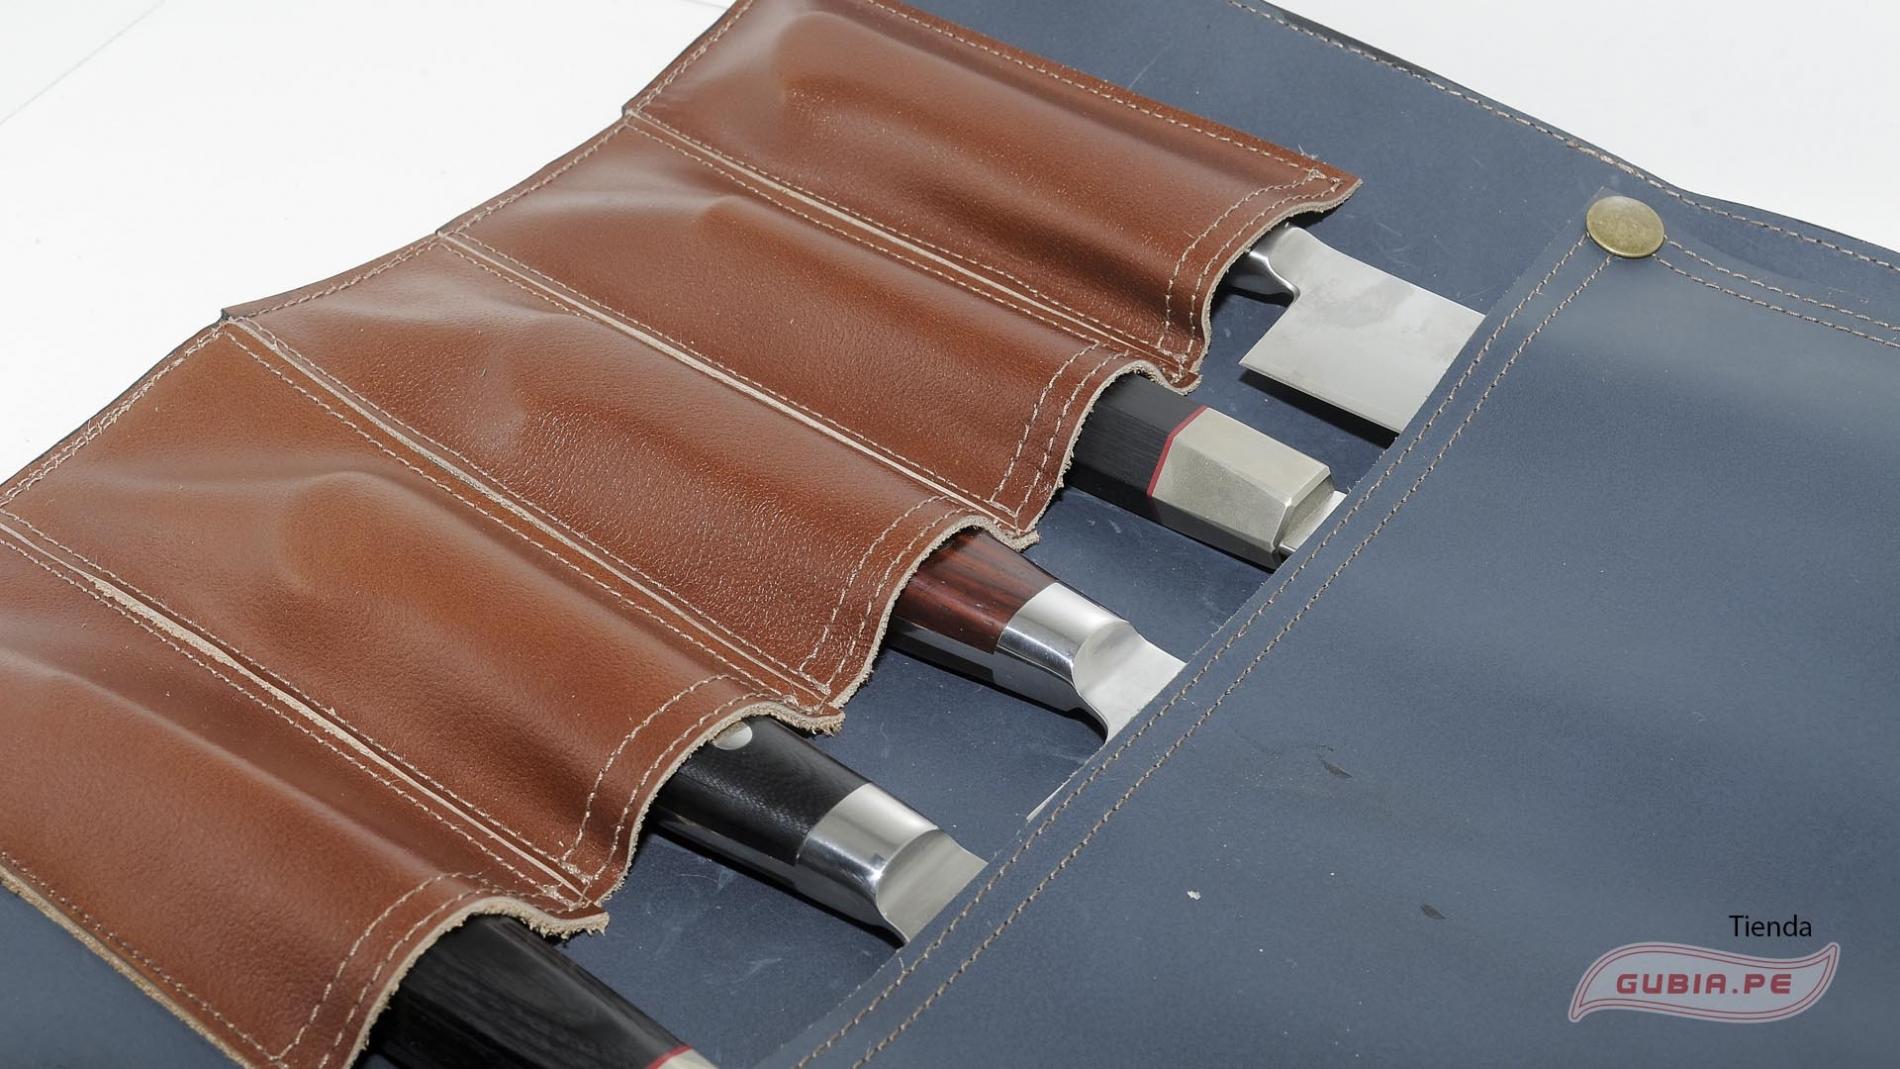 GUB0080-Maletin de cuero para cuchillos -max-3.